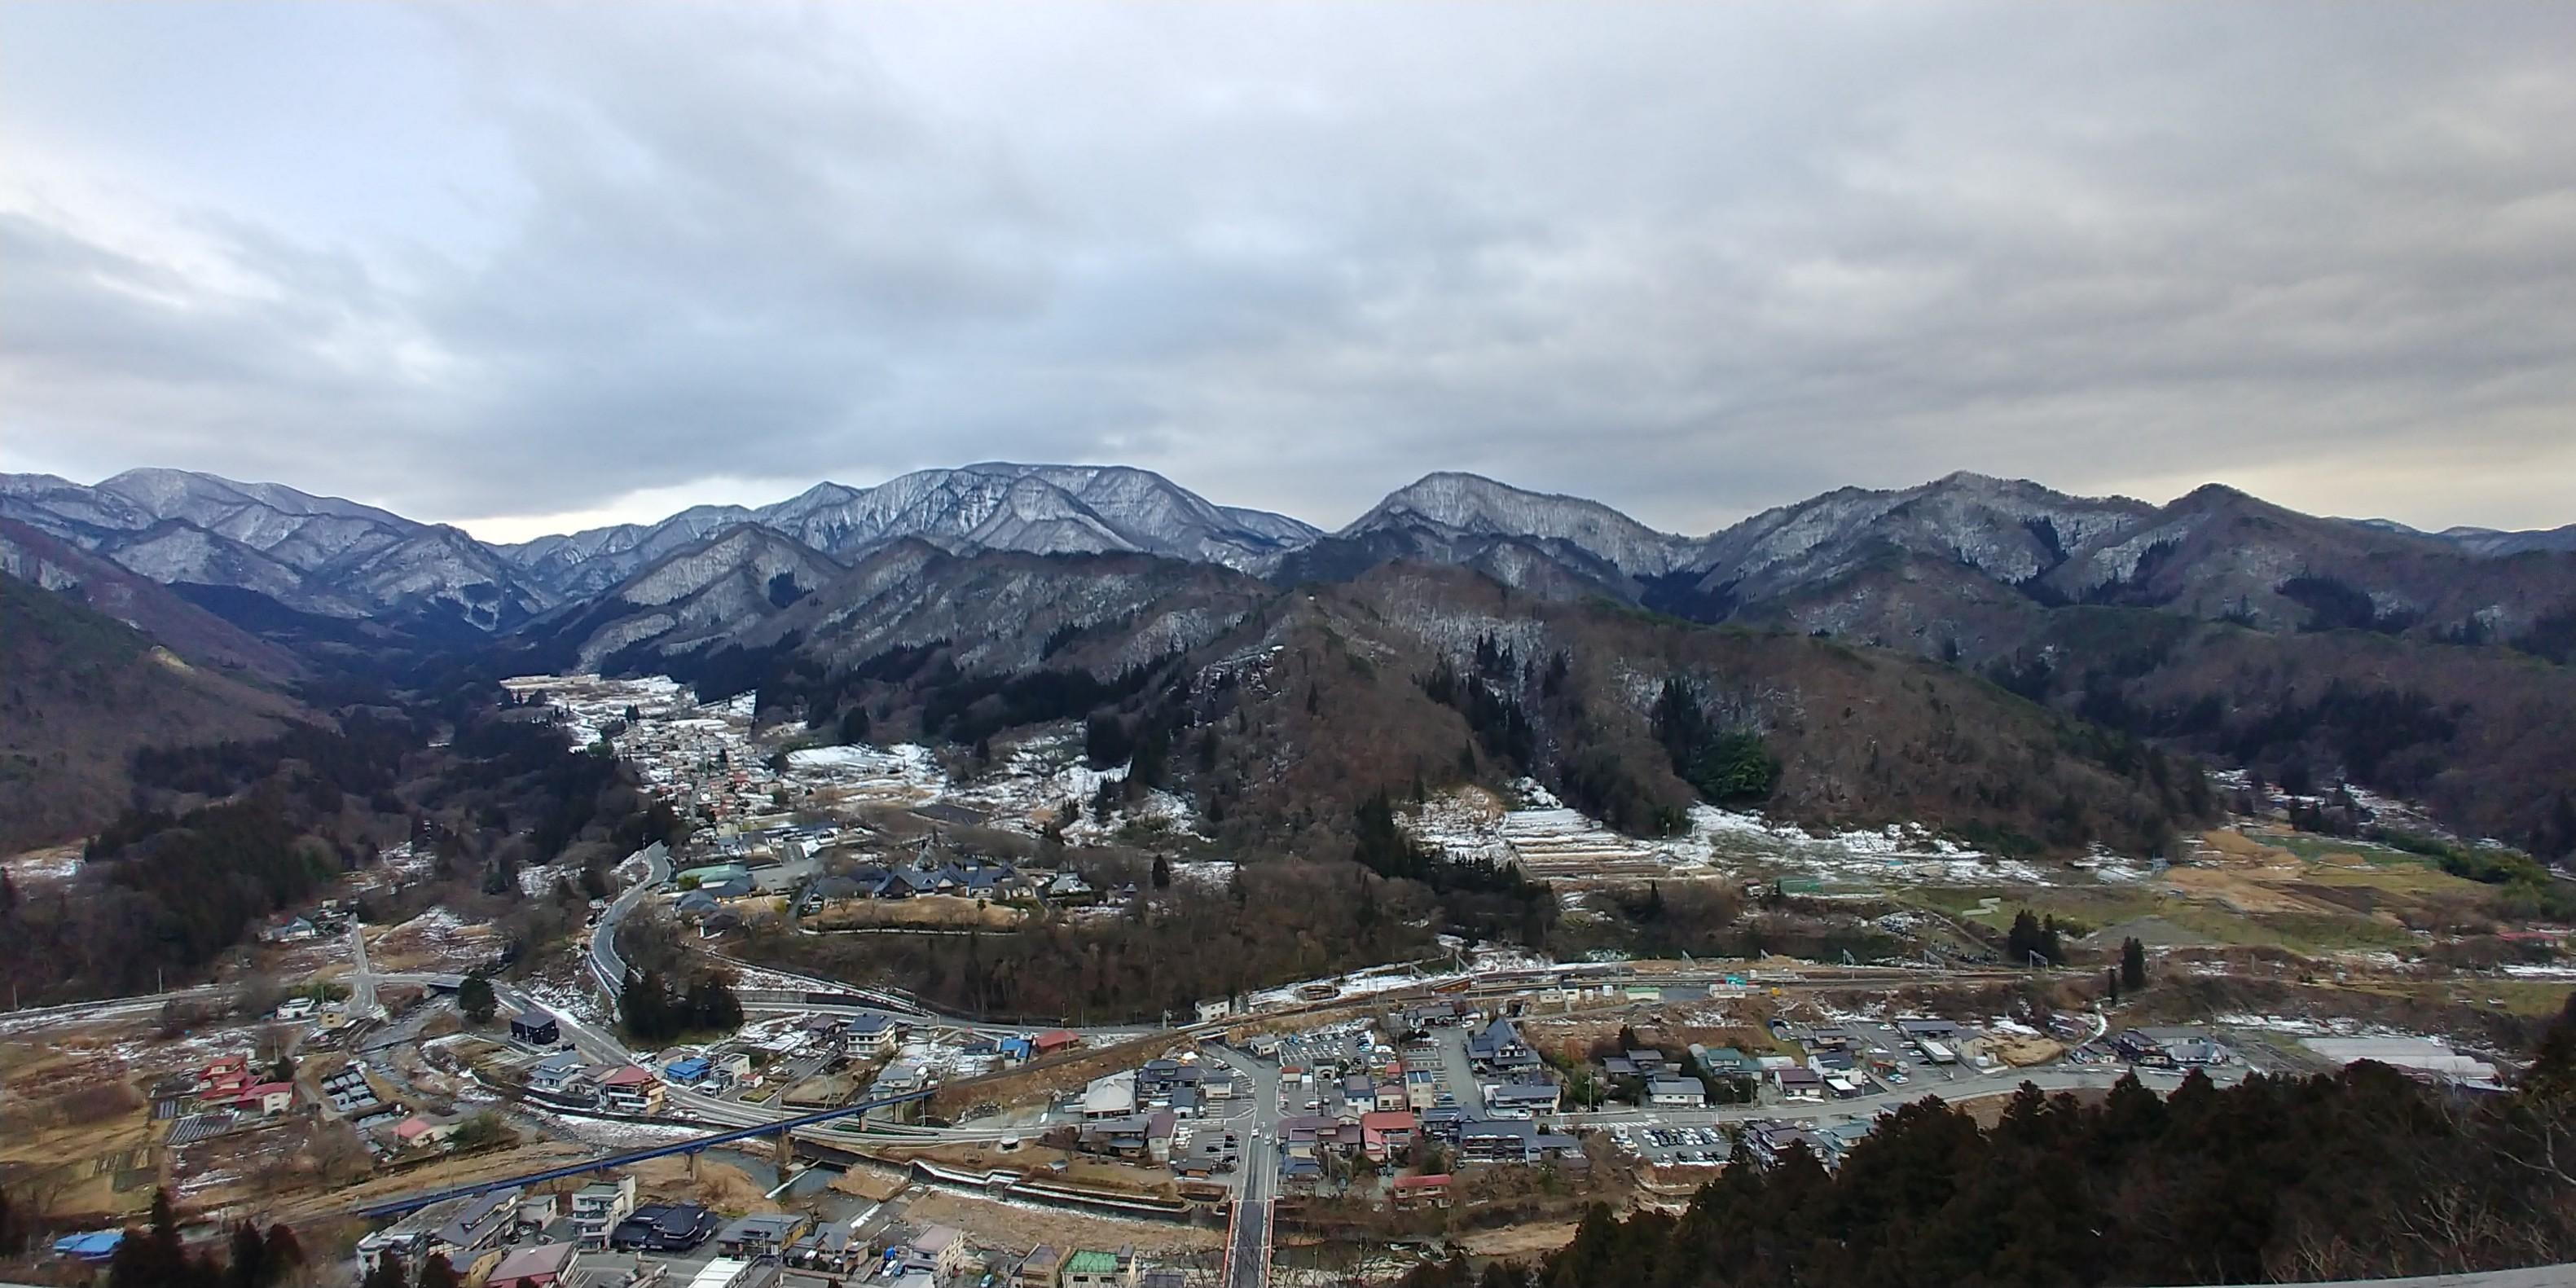 f:id:kishuji-kaisoku:20200127112011j:image